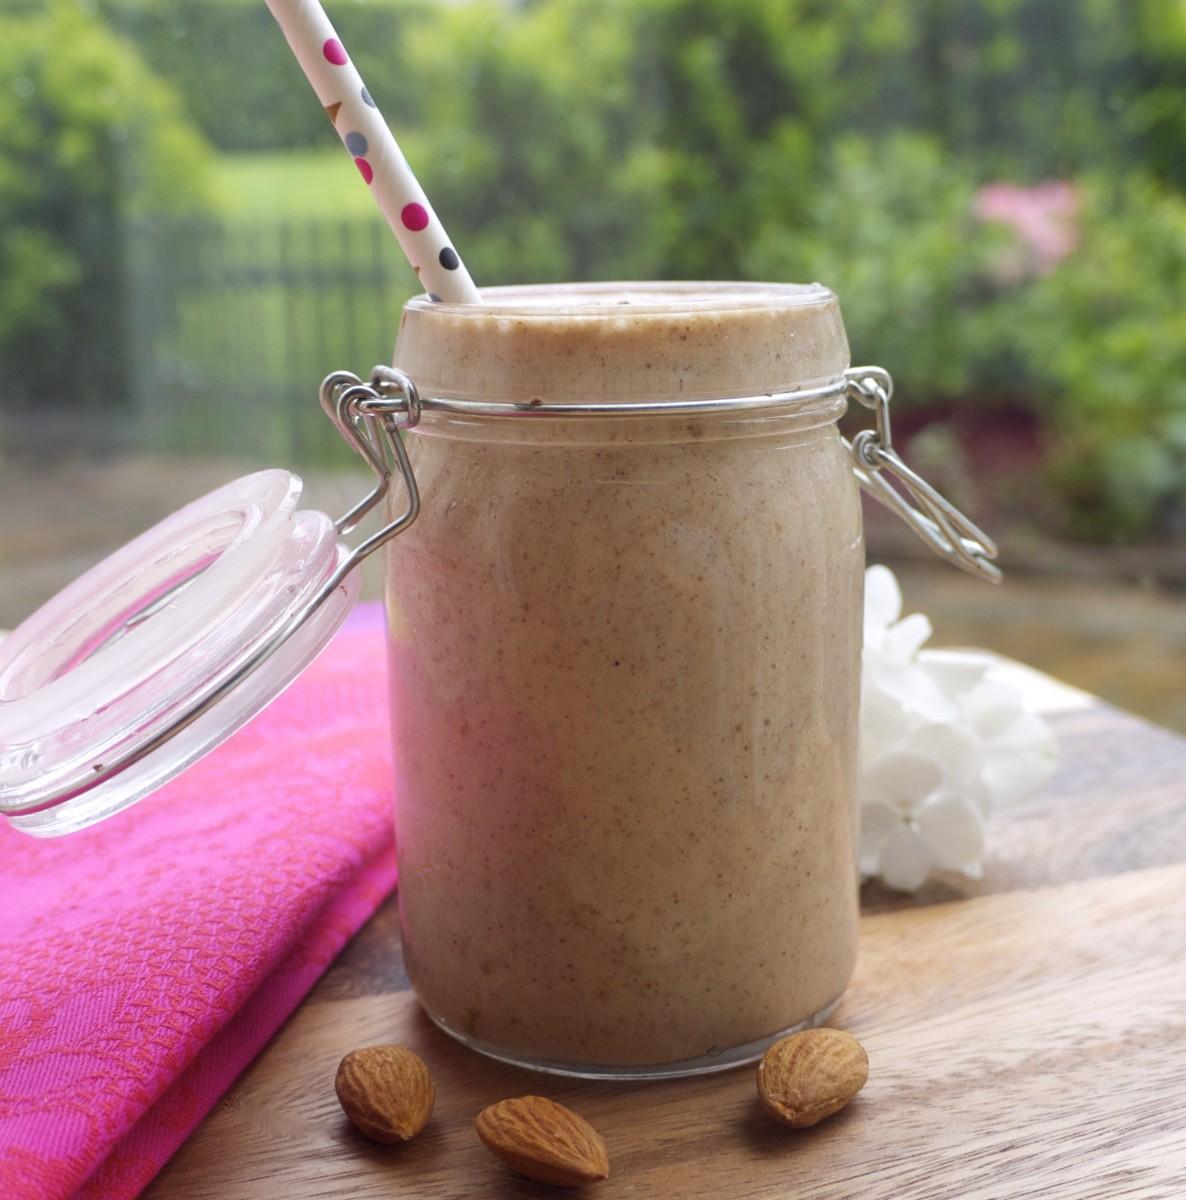 Creamy Almond-Cinnamon Shake